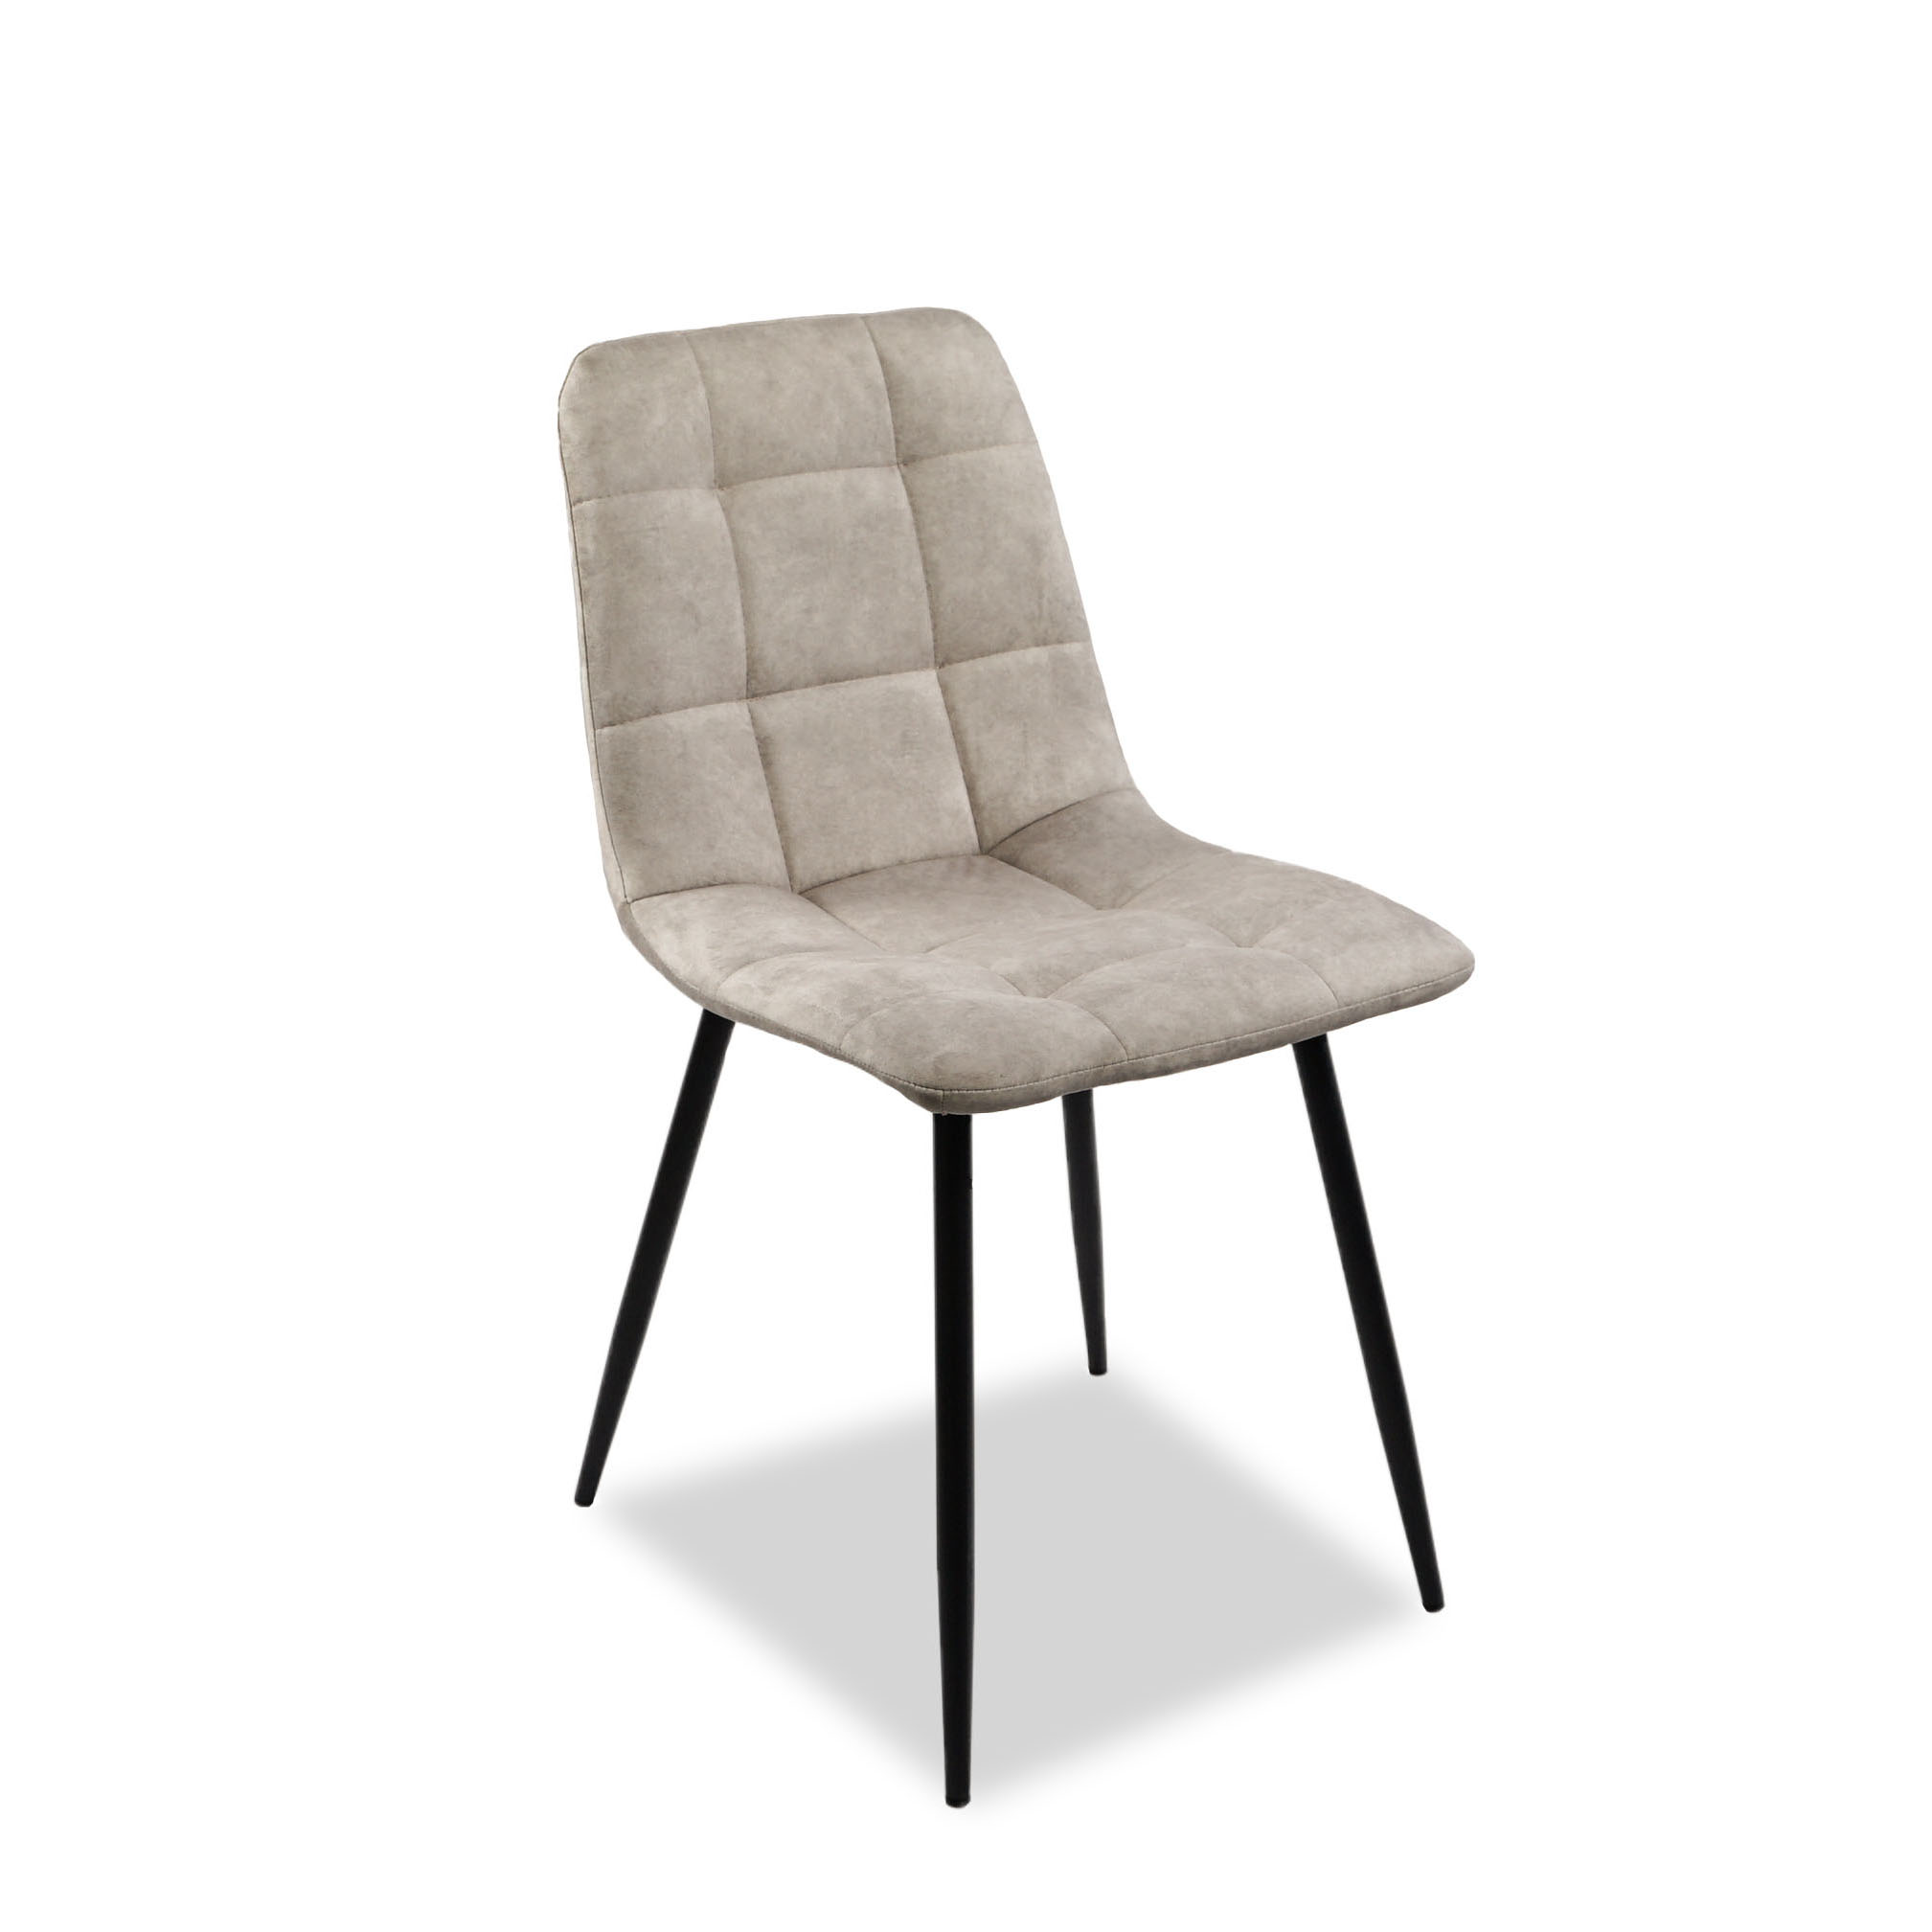 4 pcs Dining chair,…